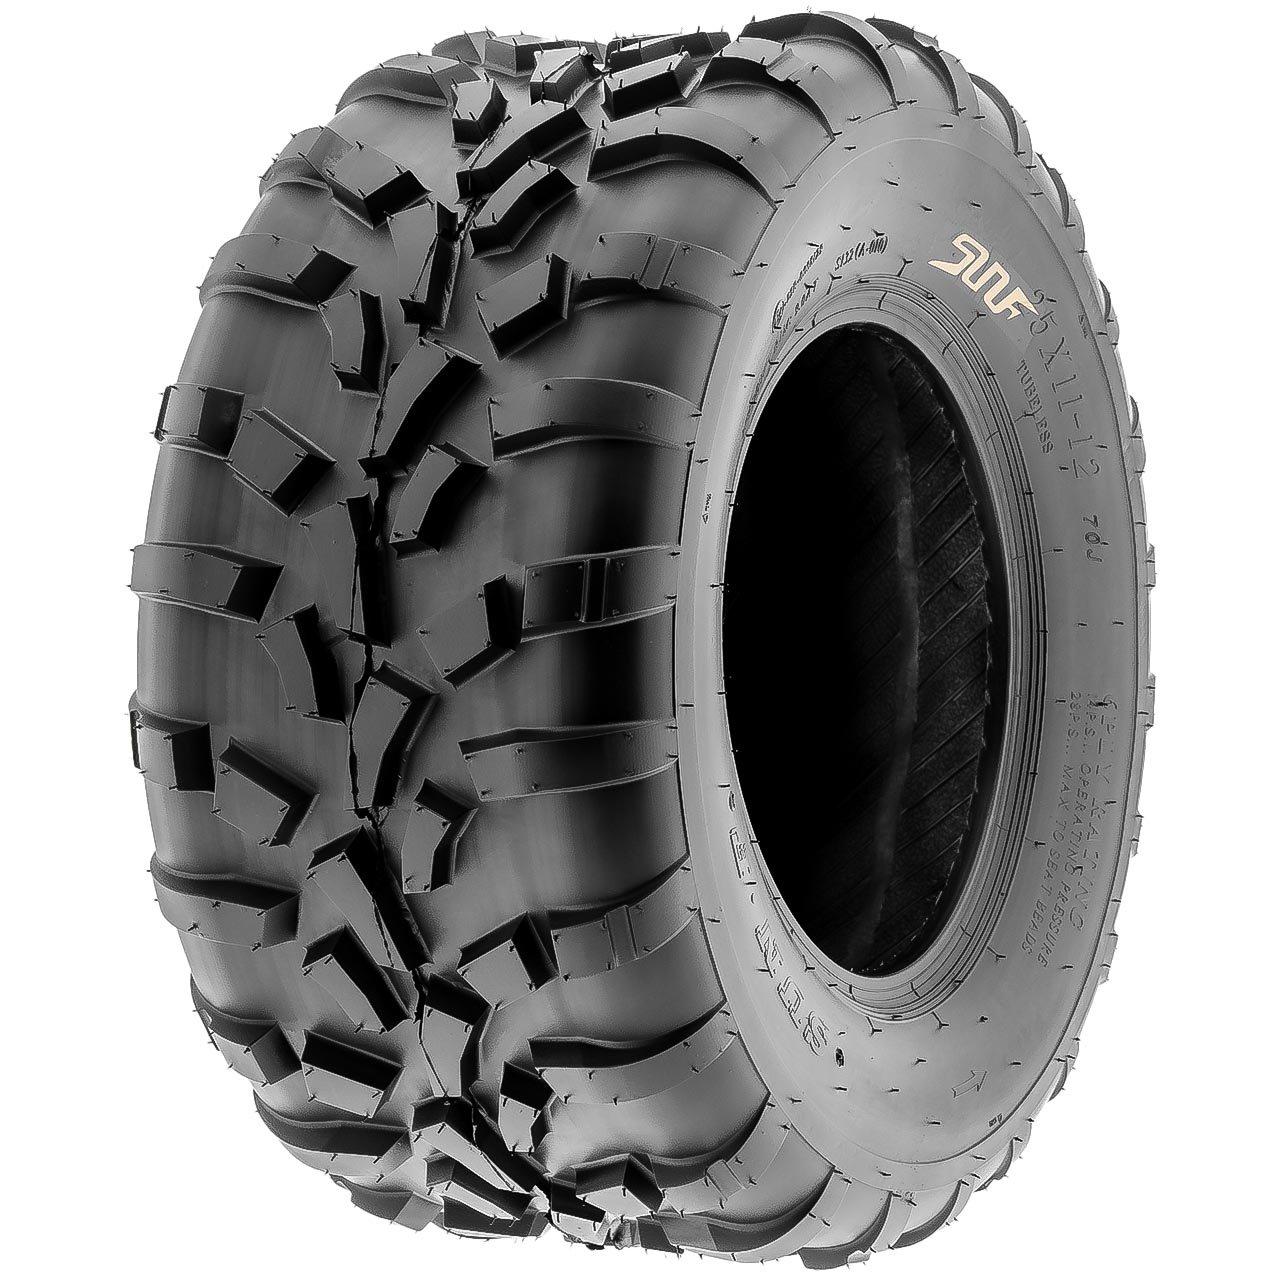 SunF 25x10-12 (25x10x12) ATV/UTV Off-Road Tire, 6PR, Directional Knobby Tread | A010